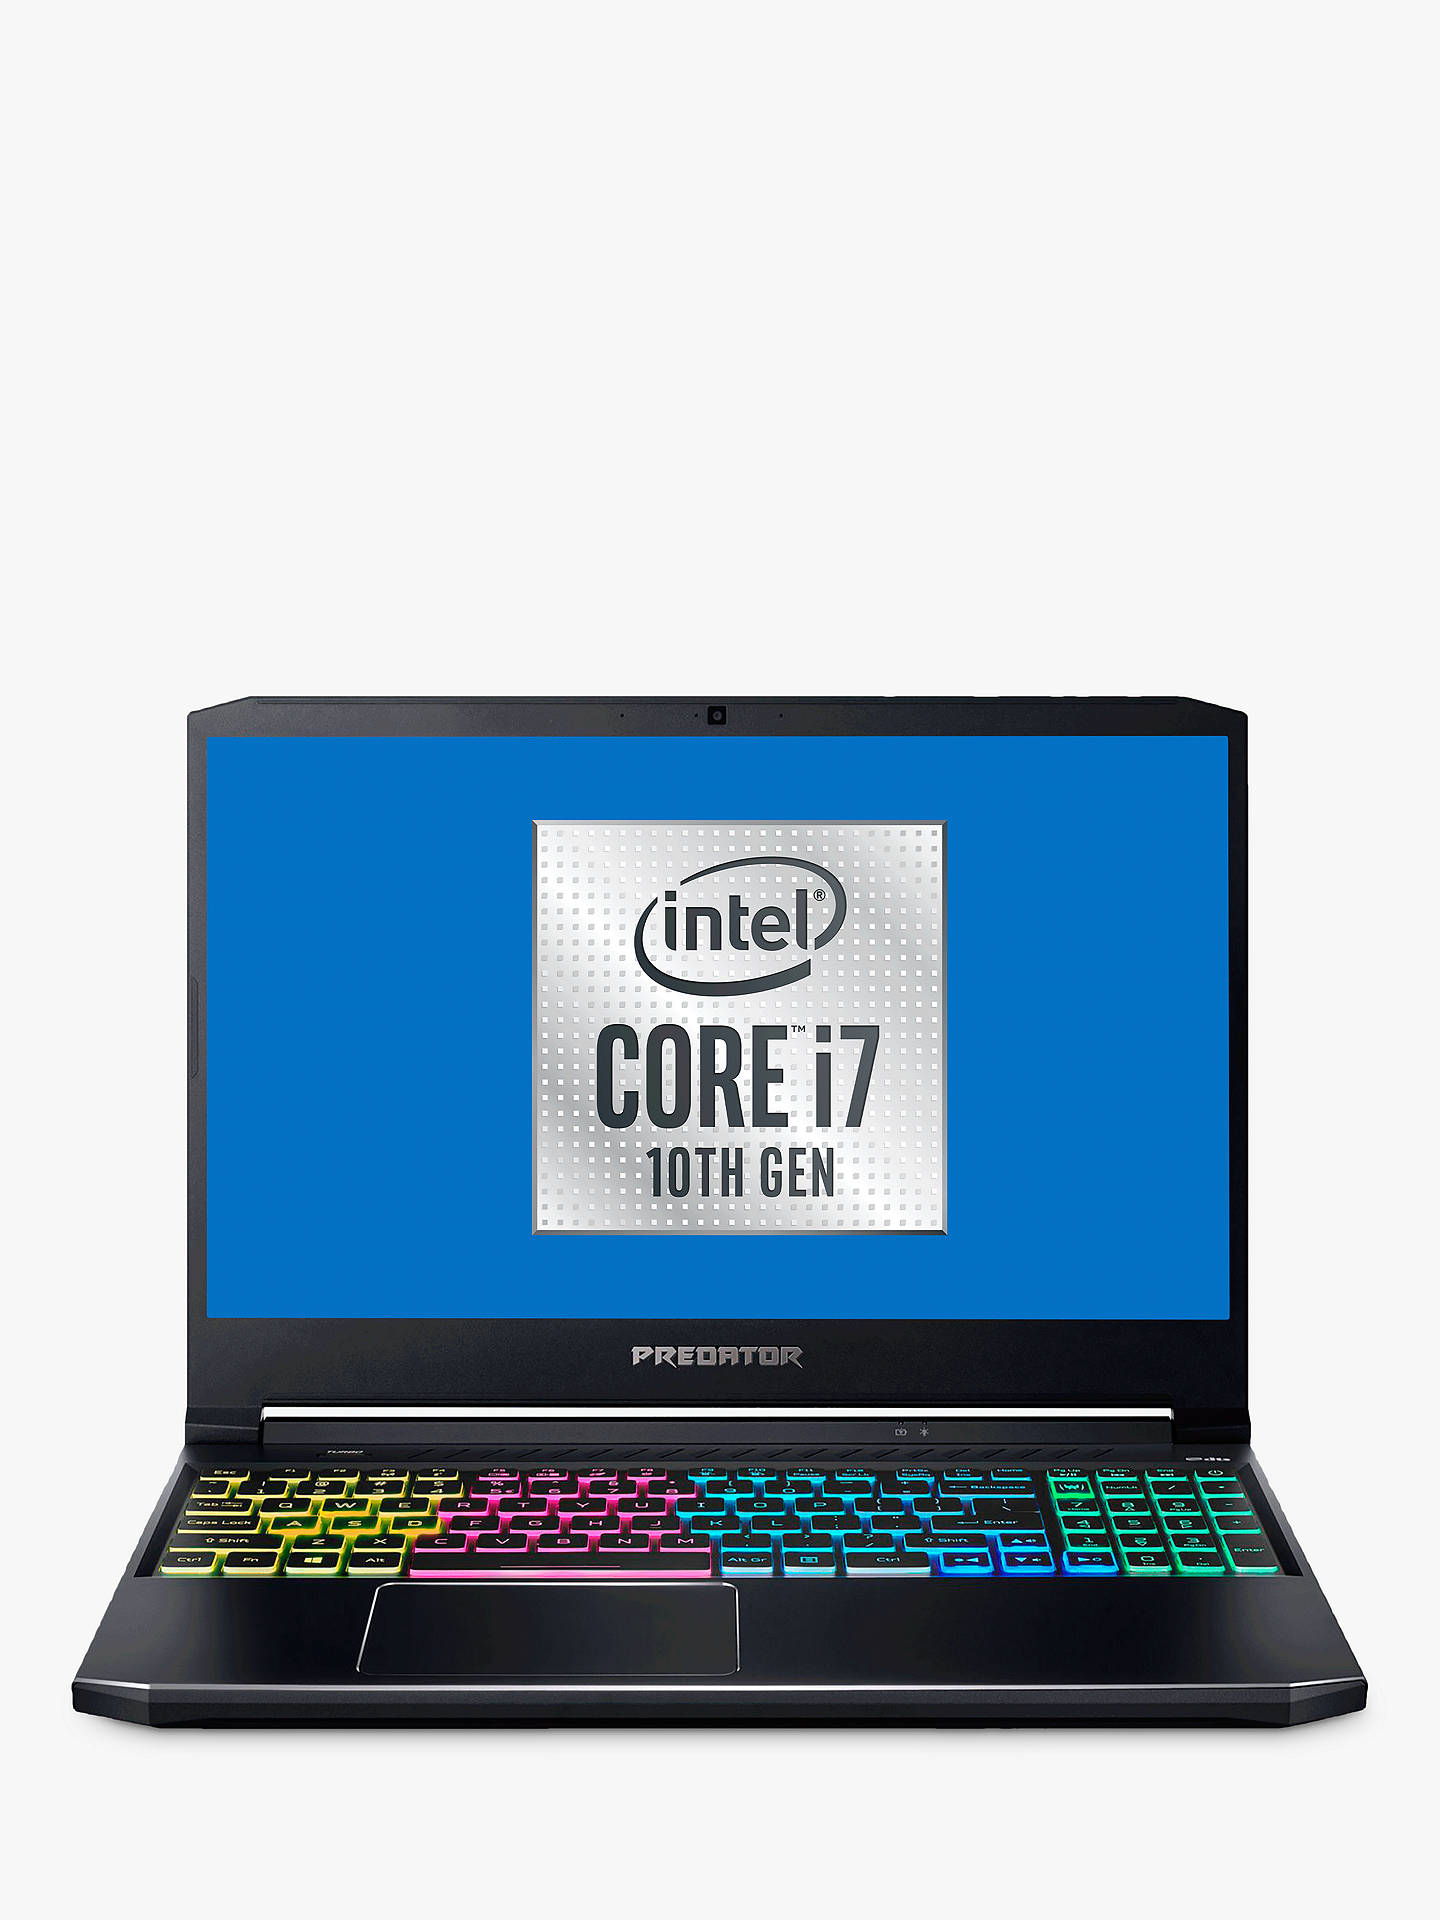 Acer Predator Helios 300 Gaming Laptop Intel Core I7 Processor 16gb Ram 512gb Ssd Geforce Rtx 2060 15 6 Full Hd Grey Dark At John Lewis Partners